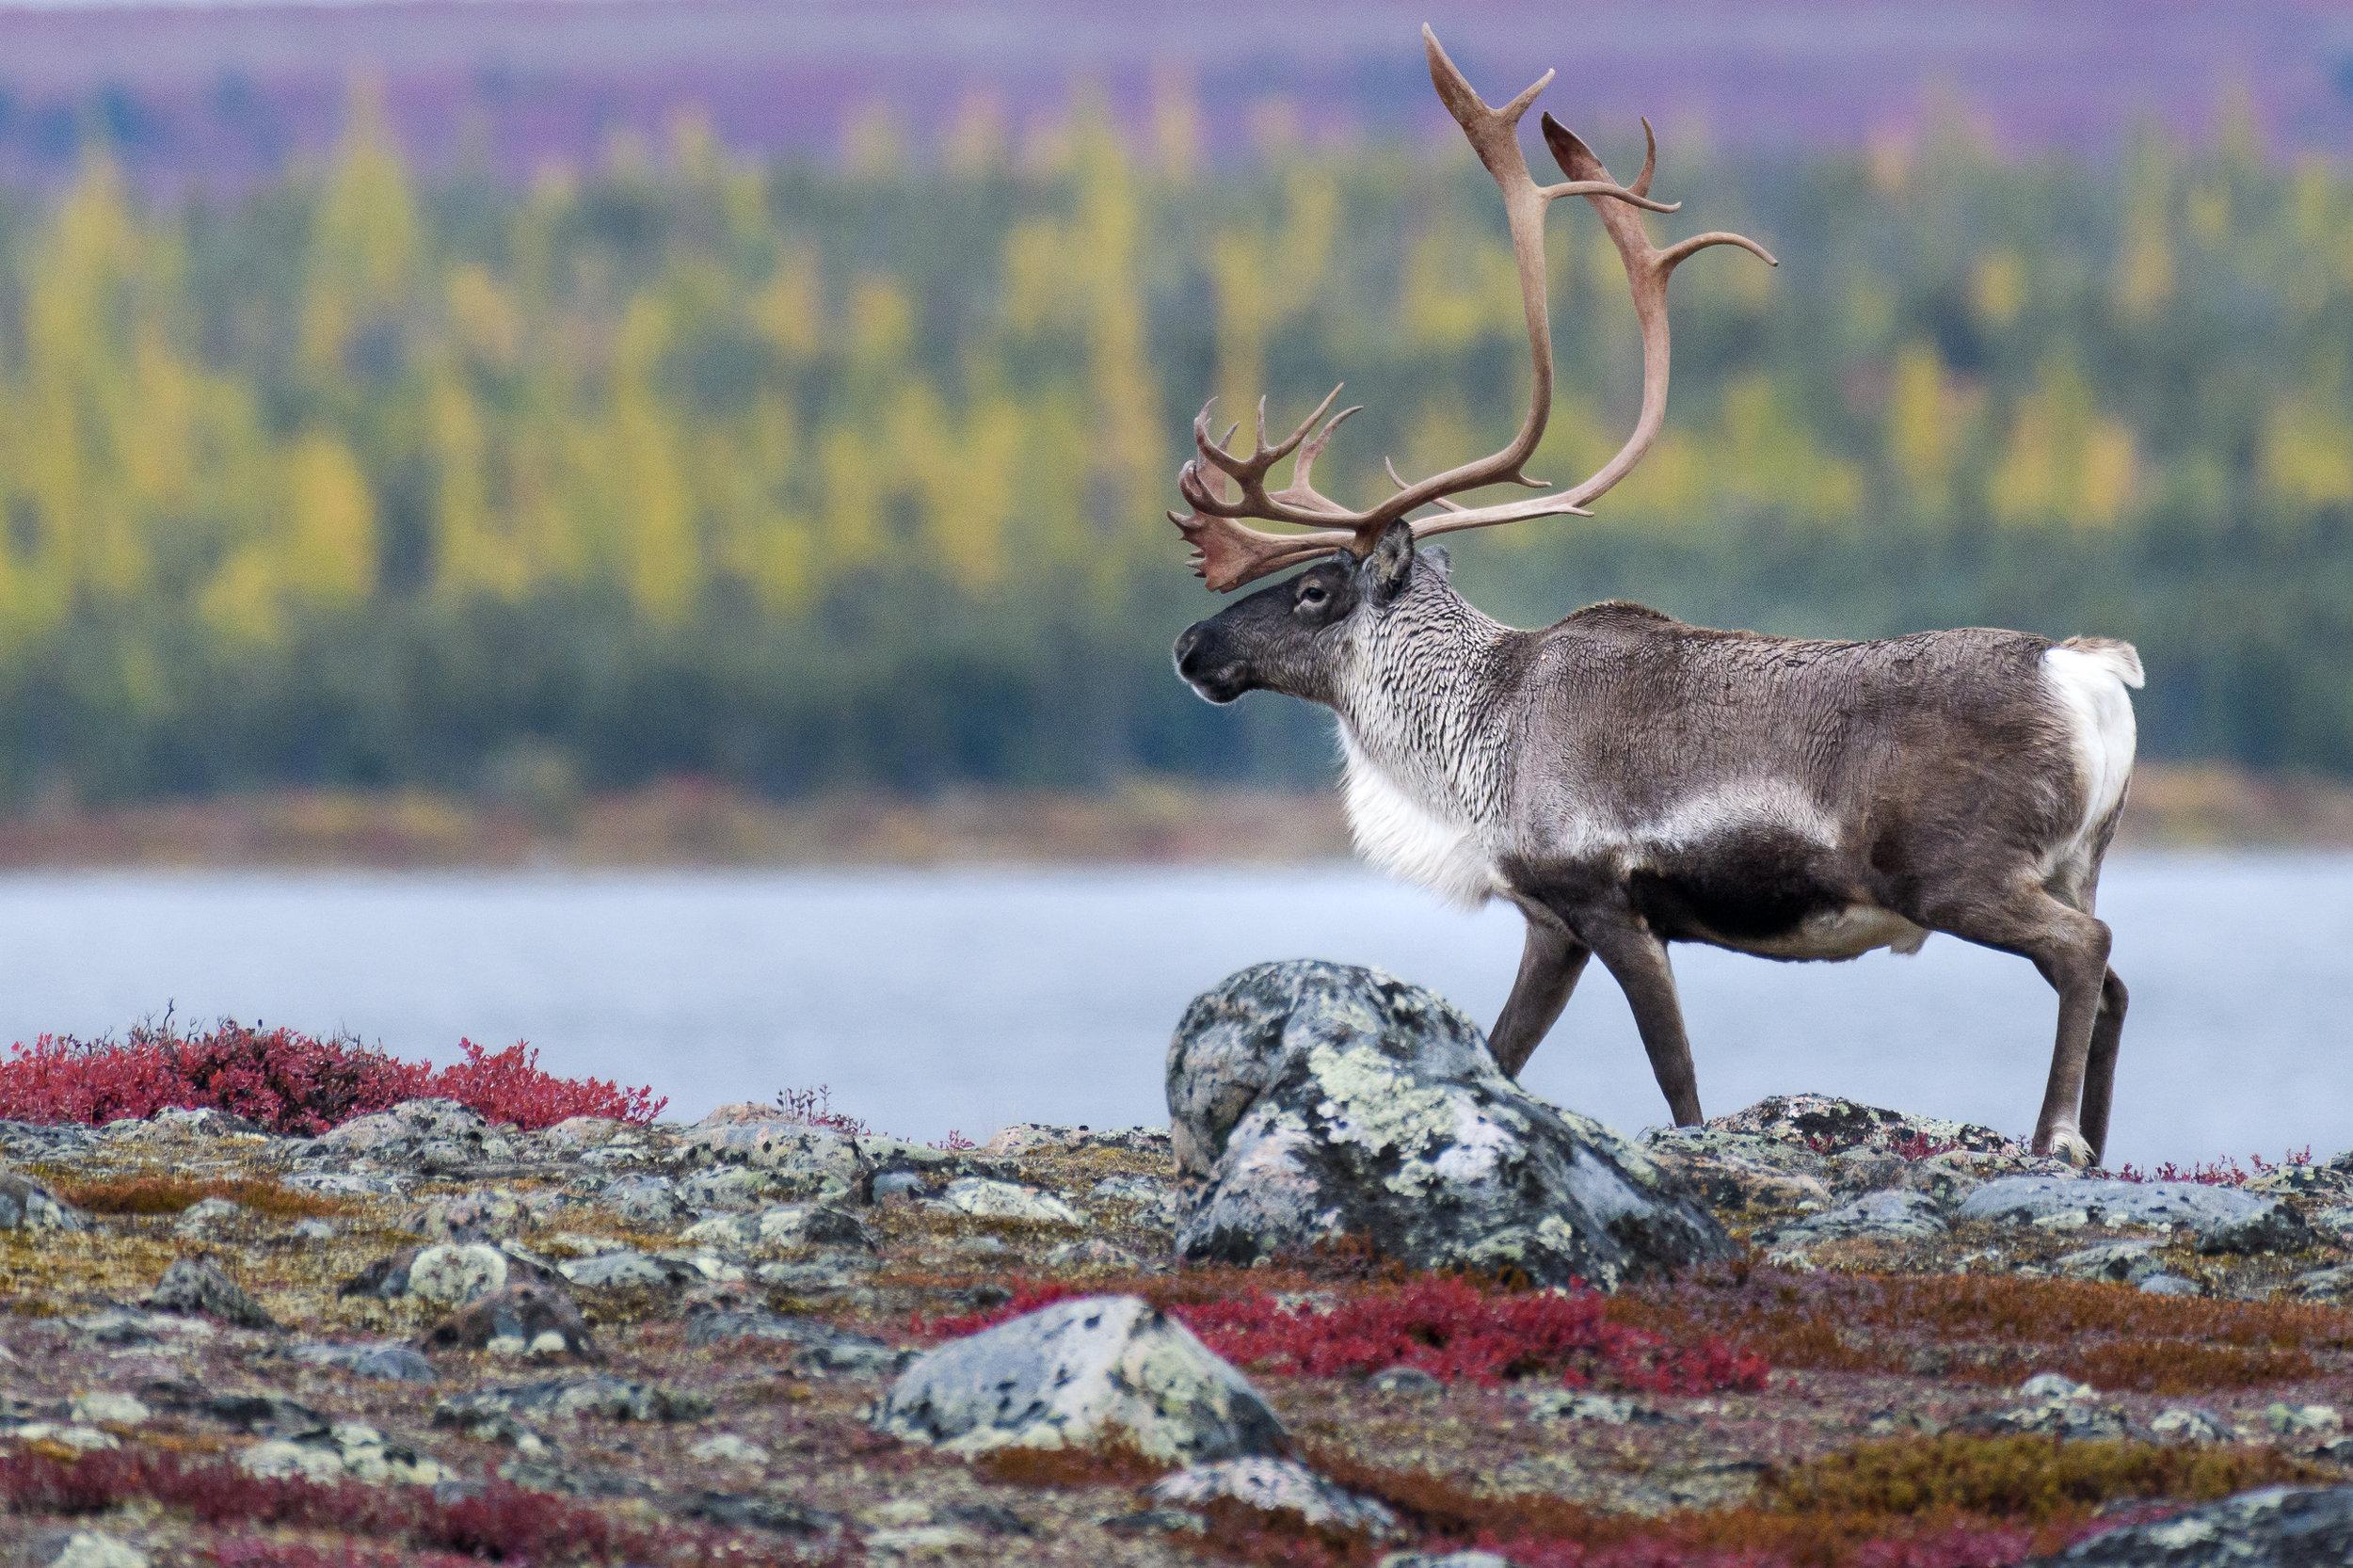 photo_workshop_canadian_arctic-7.jpg